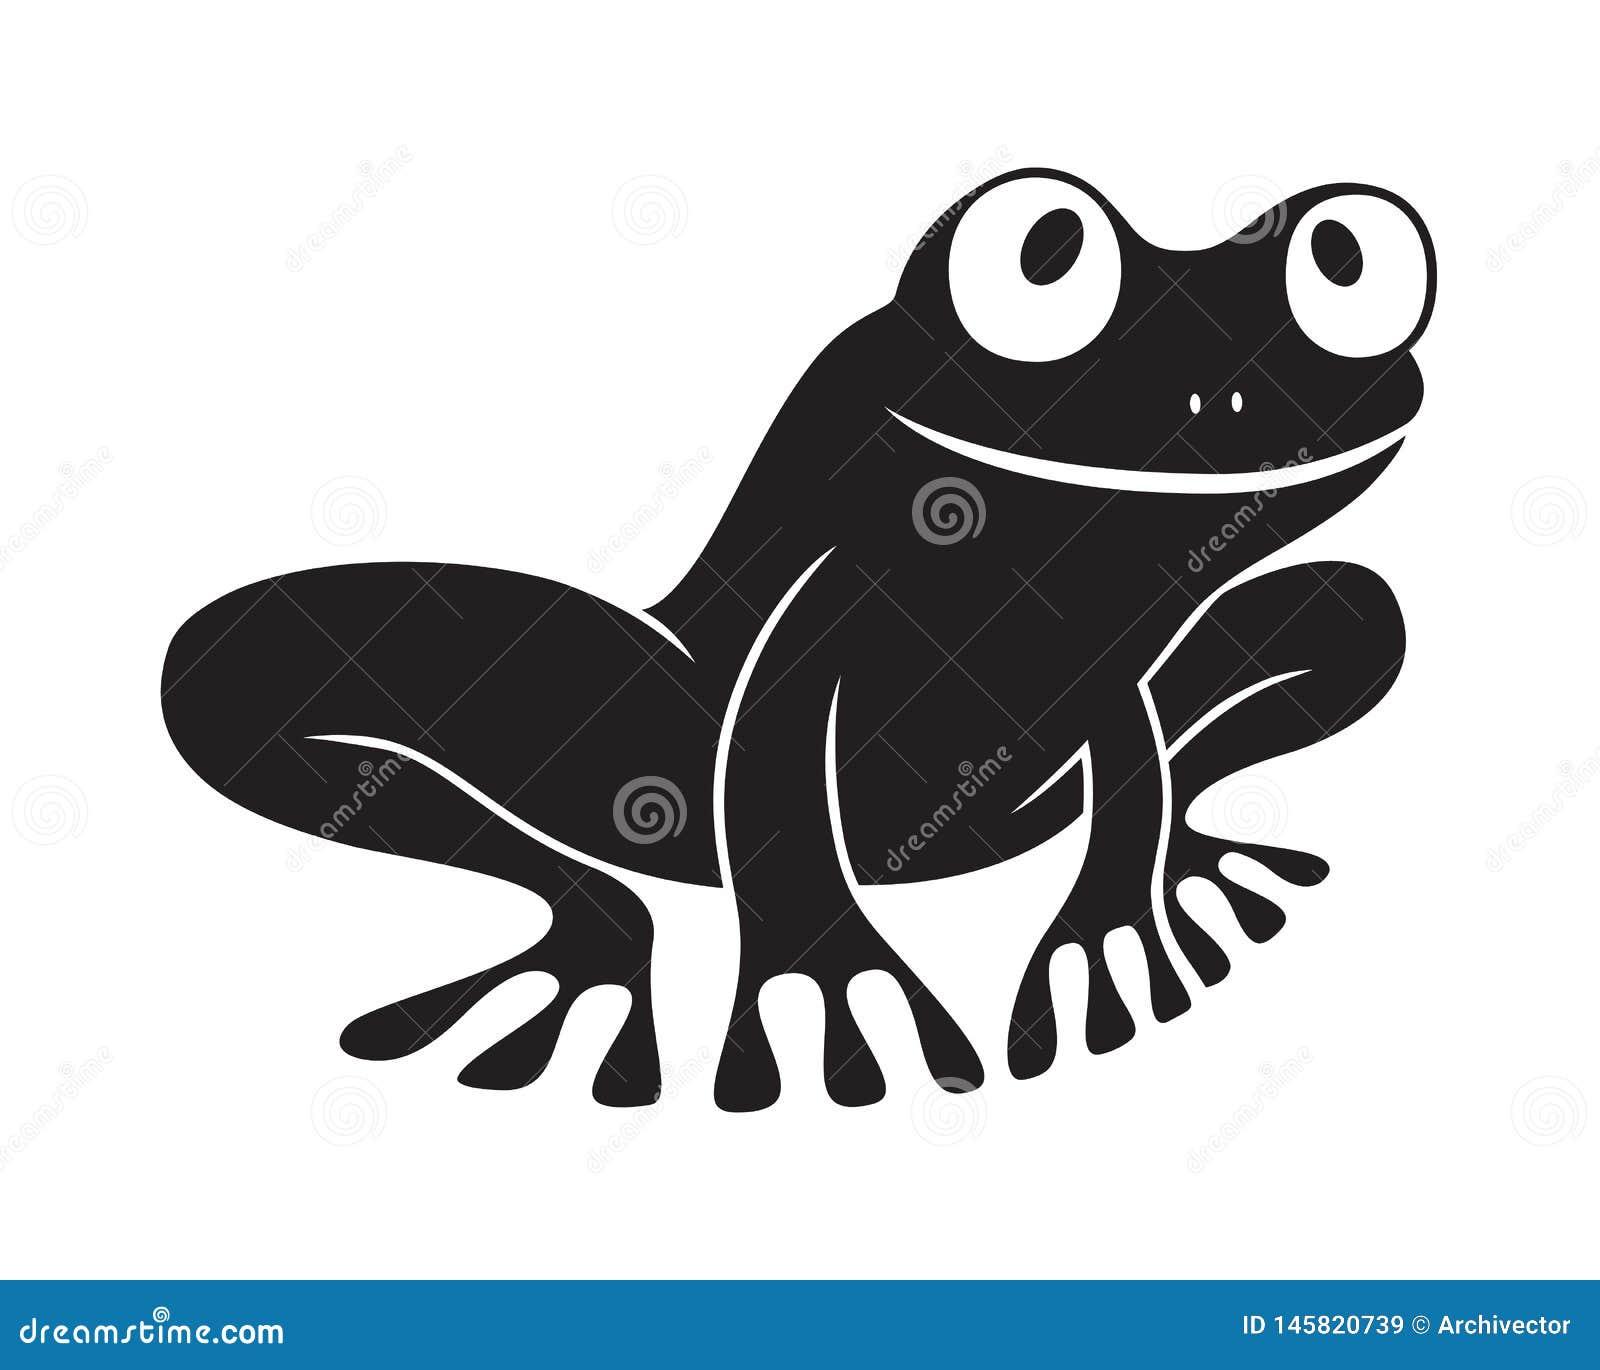 Frog black icon